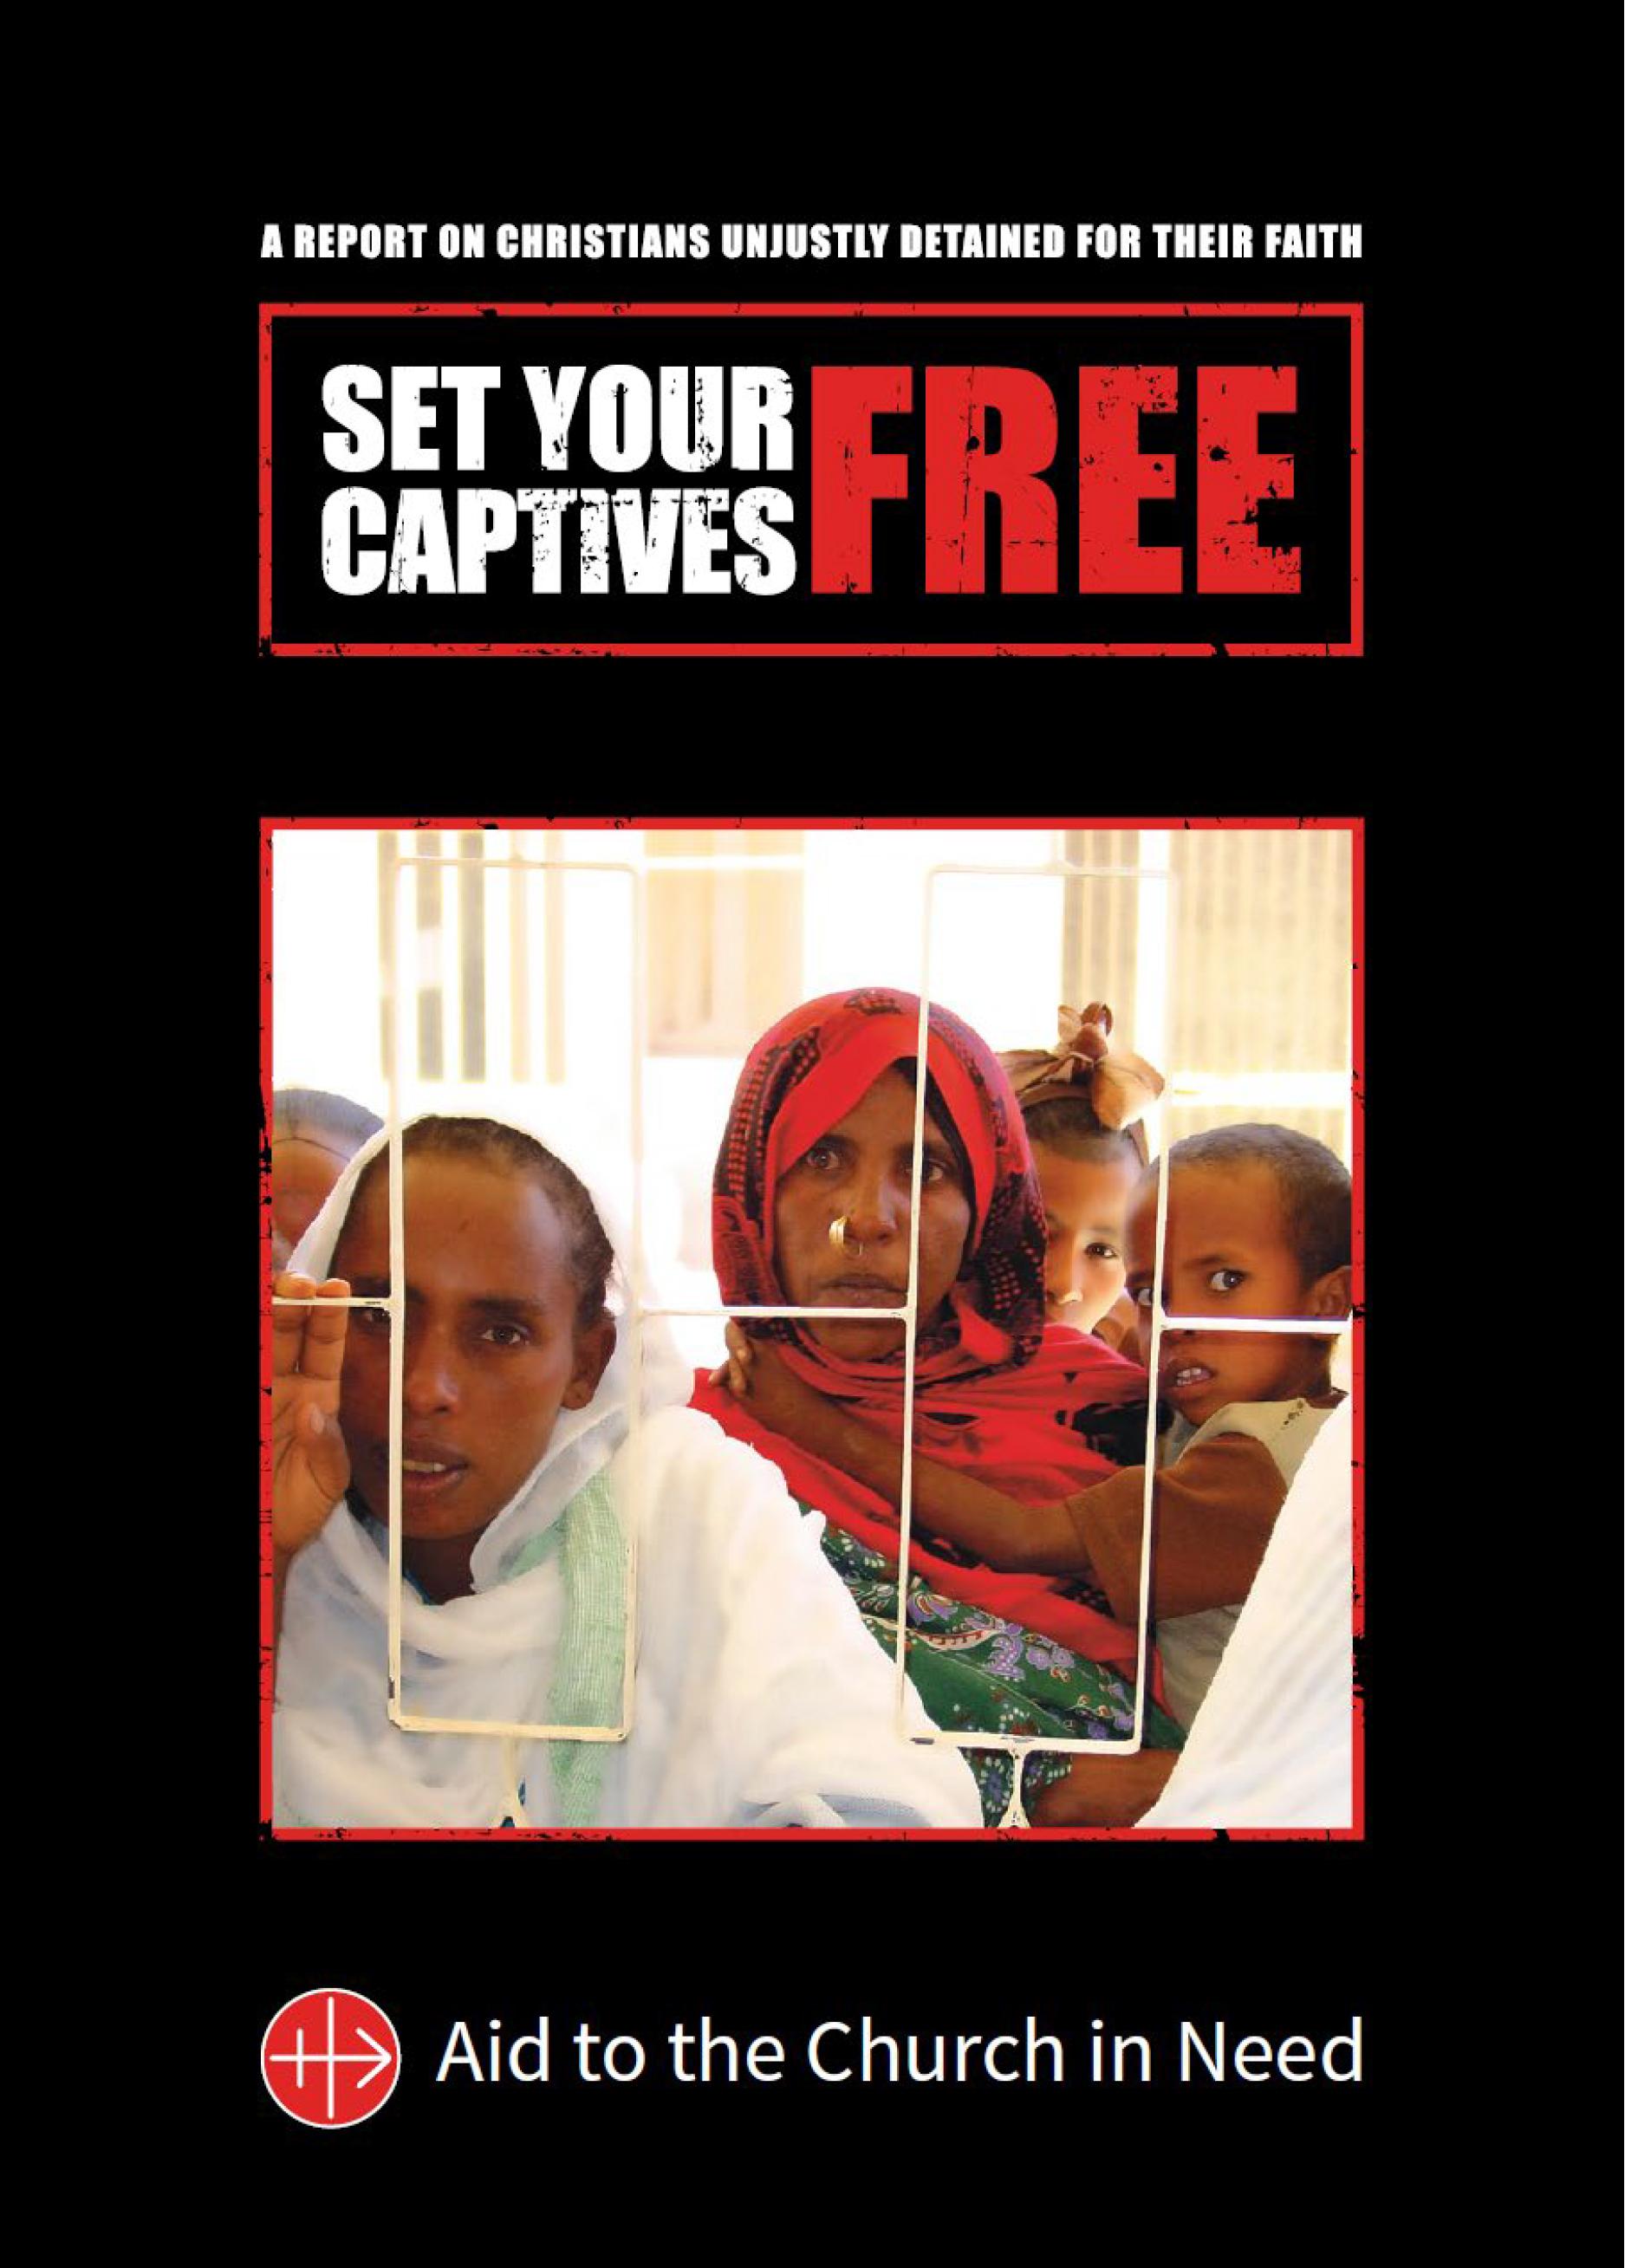 """Pon a tus cautivos en libertad"", un informe sobre cristianos retenidos por su fe"